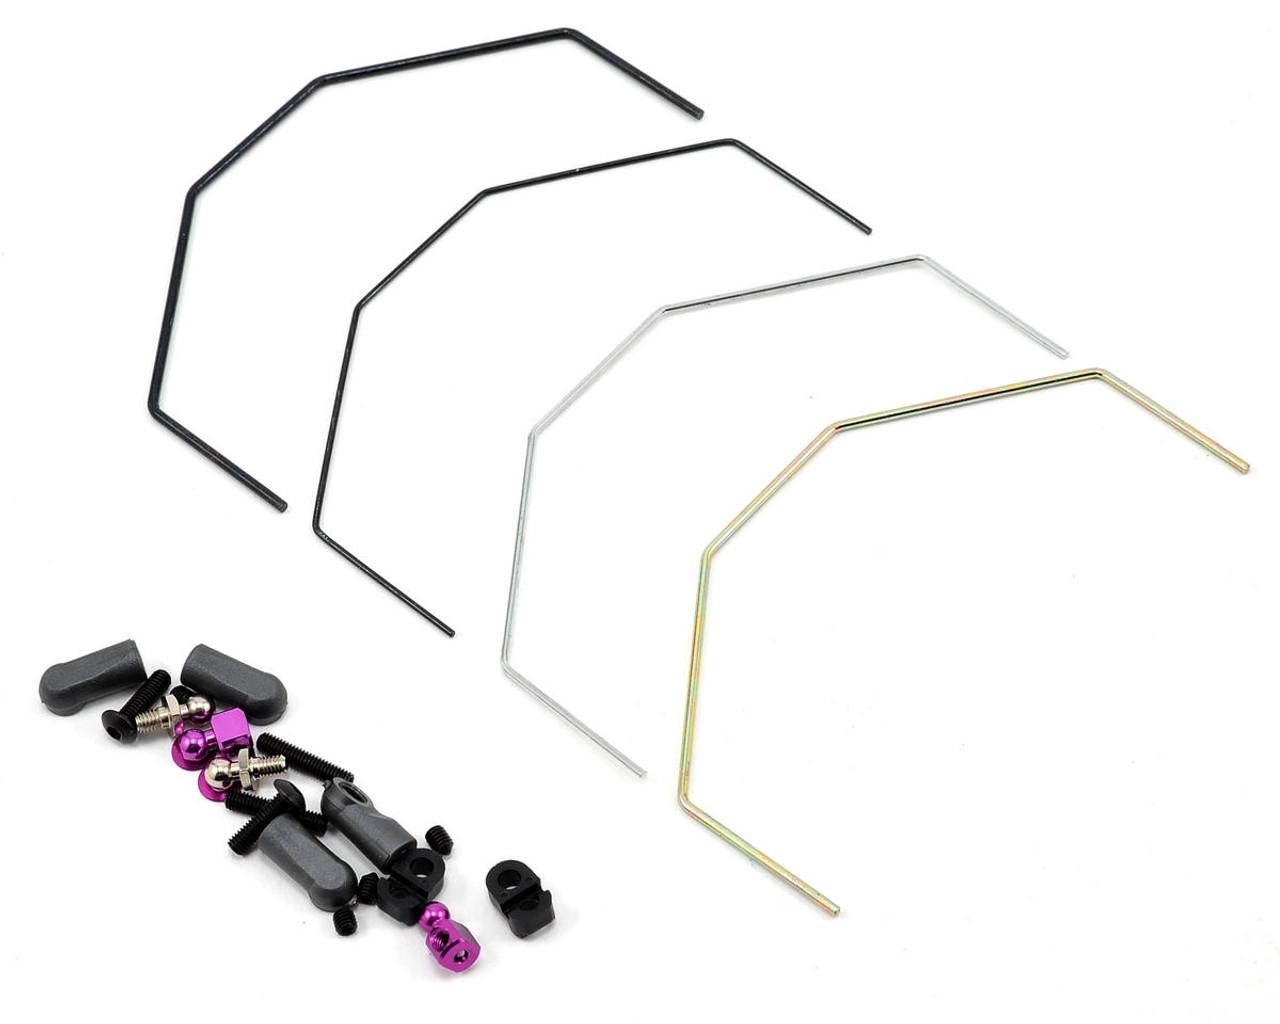 Schumacher Racing U7100 Rear Roll Bar Kit Cougar KC